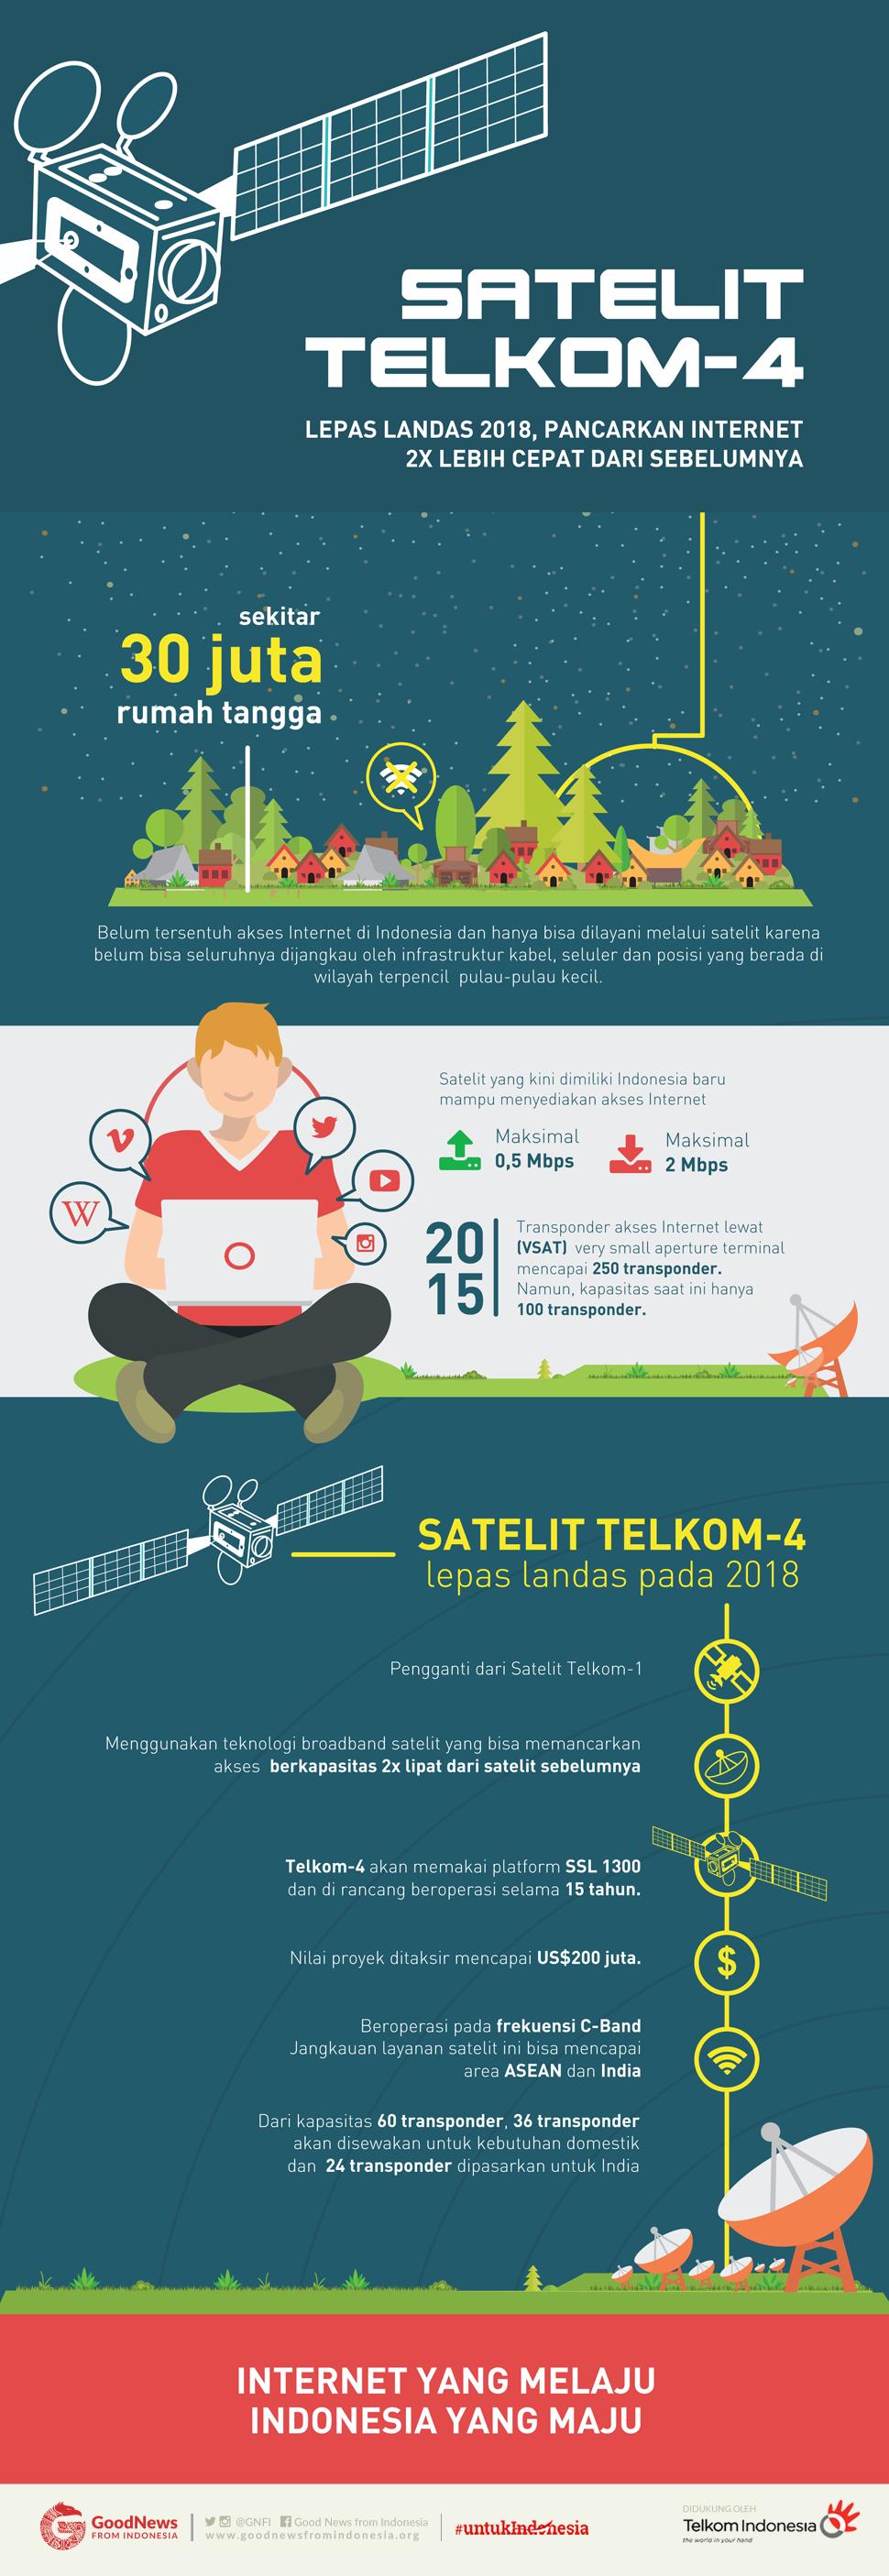 Satelit Telkom-4, Pancarkan Internet Cepat Ke Pelosok Negeri